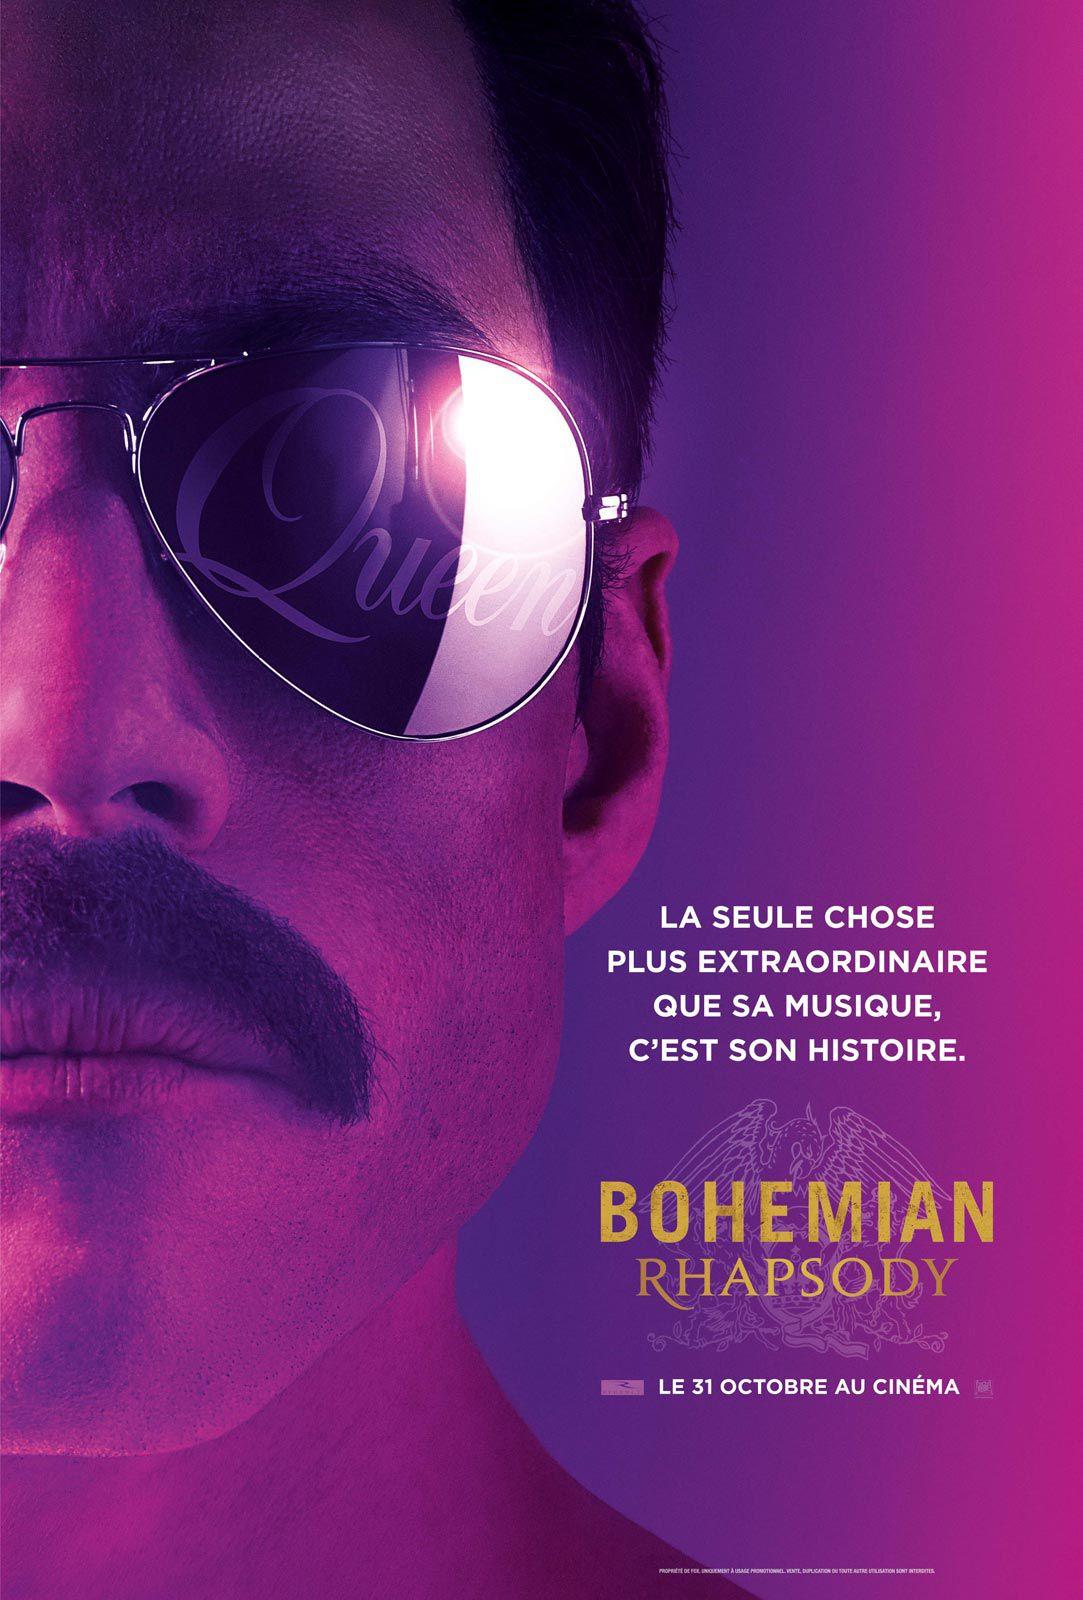 Bohemian Rhapsody - Film (2018)